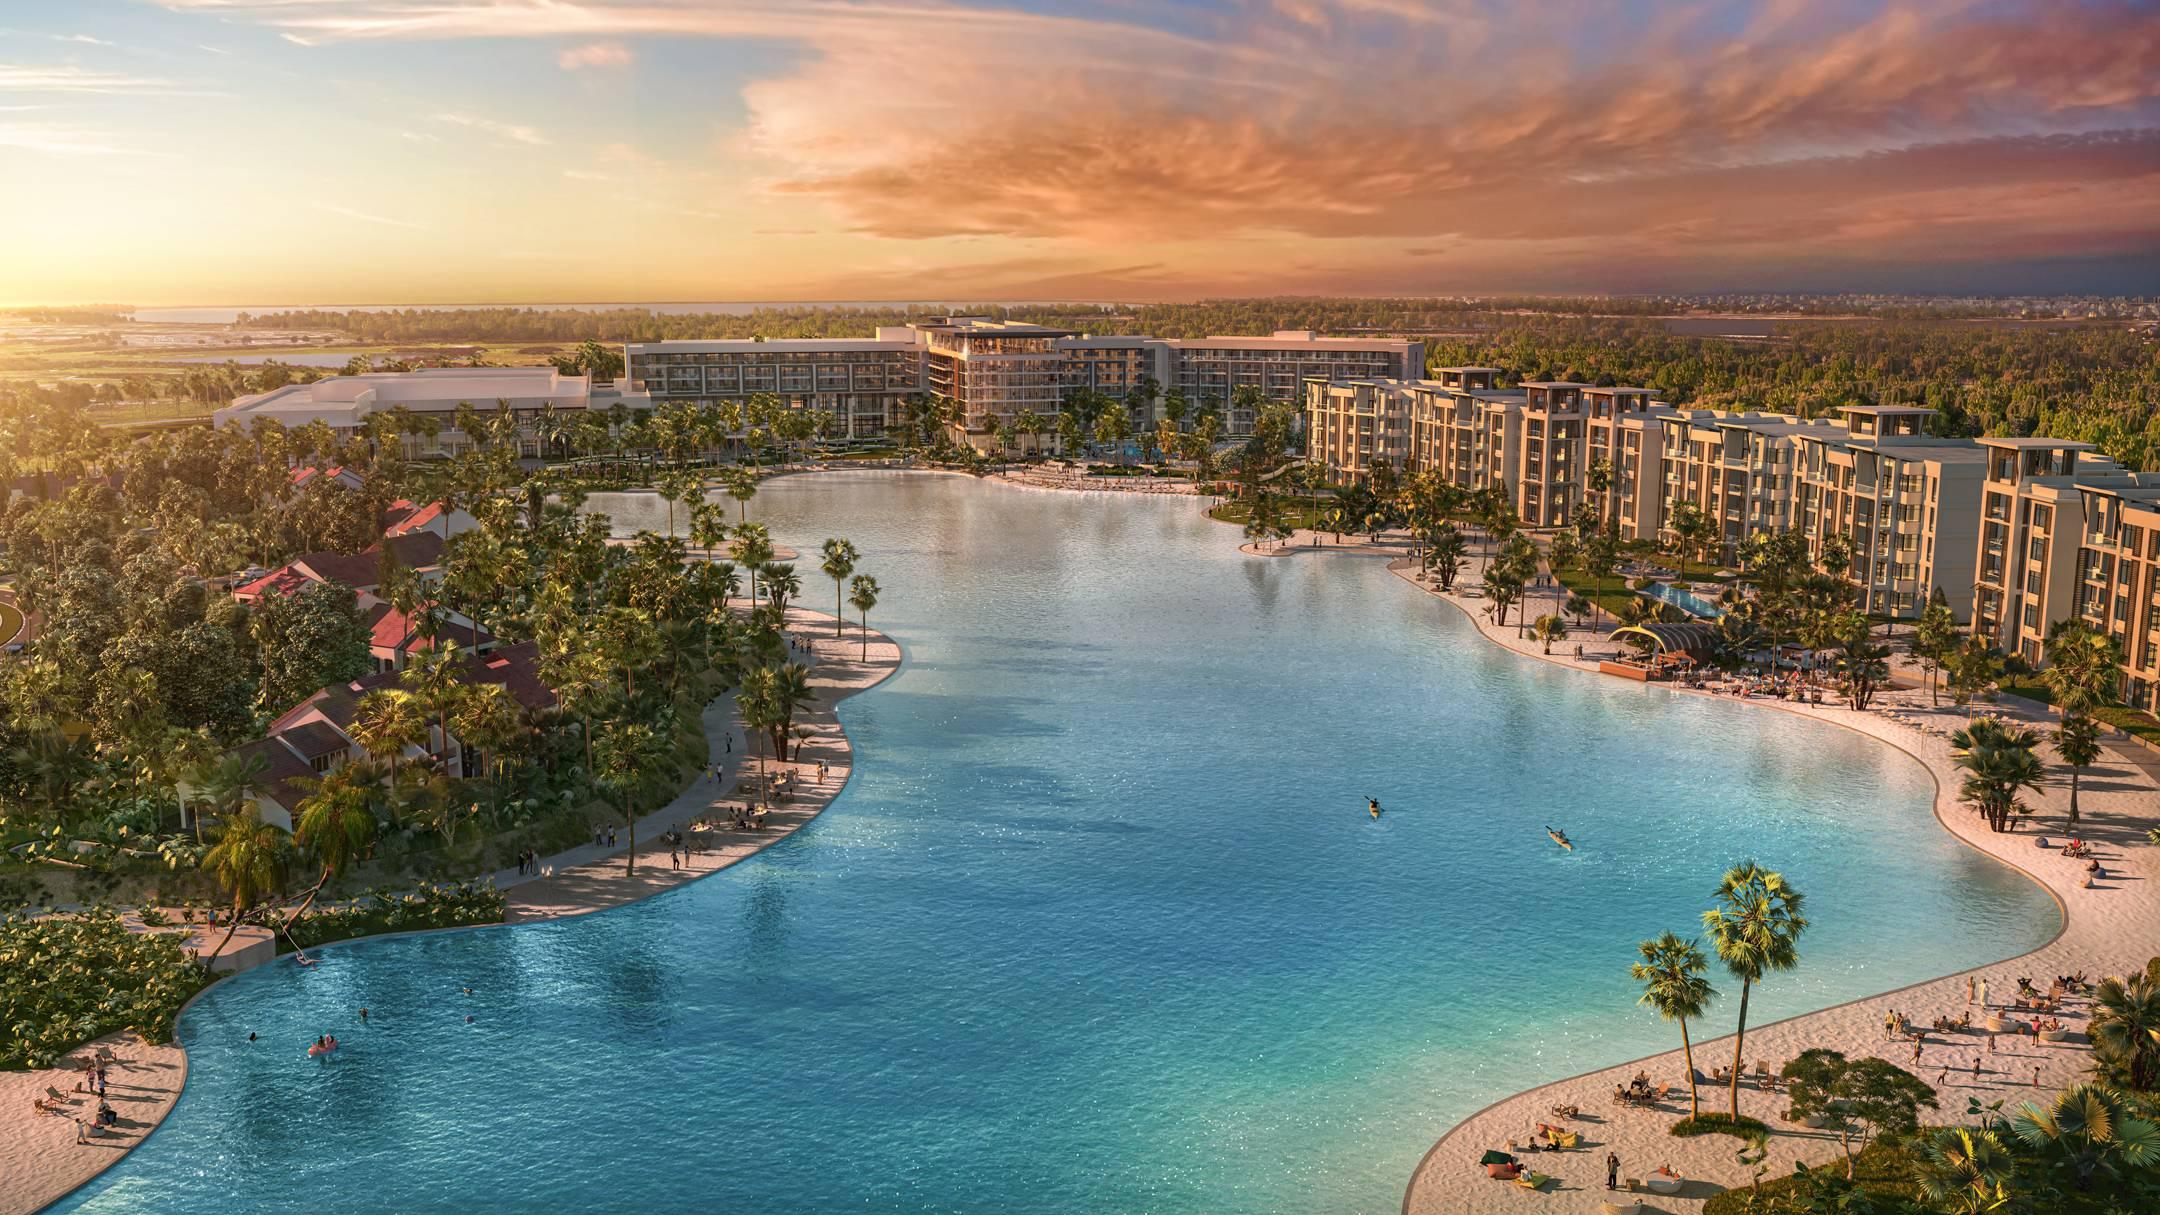 Evermore Orlando Resort overview